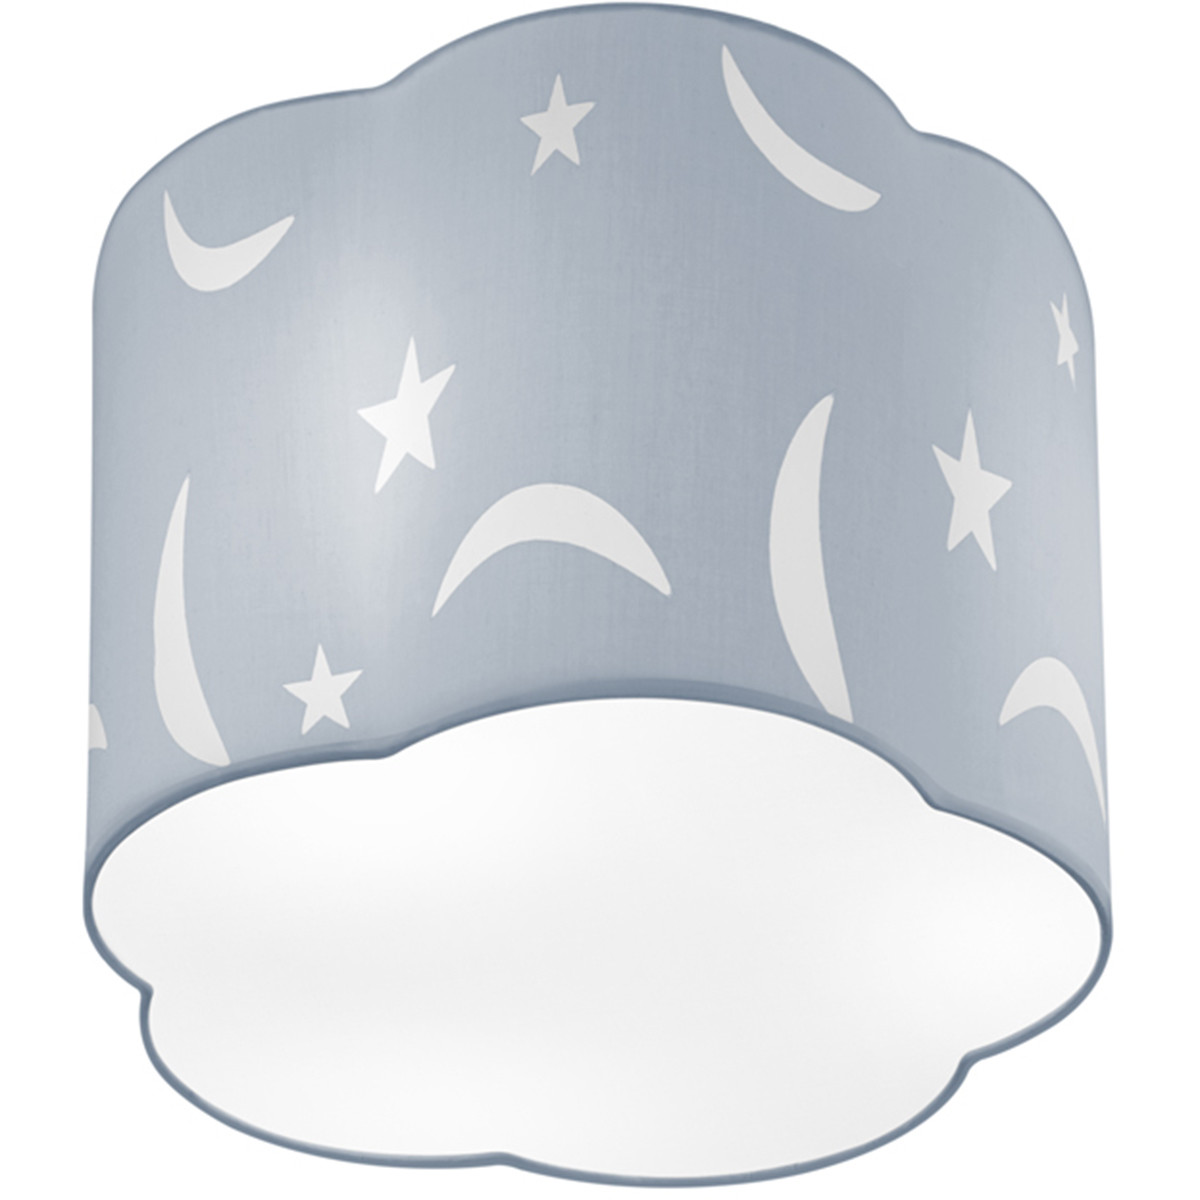 LED Plafondlamp - Plafondverlichting - Trion Monimo - E27 Fitting - 1-lichts - Rond - Mat Blauw - Al